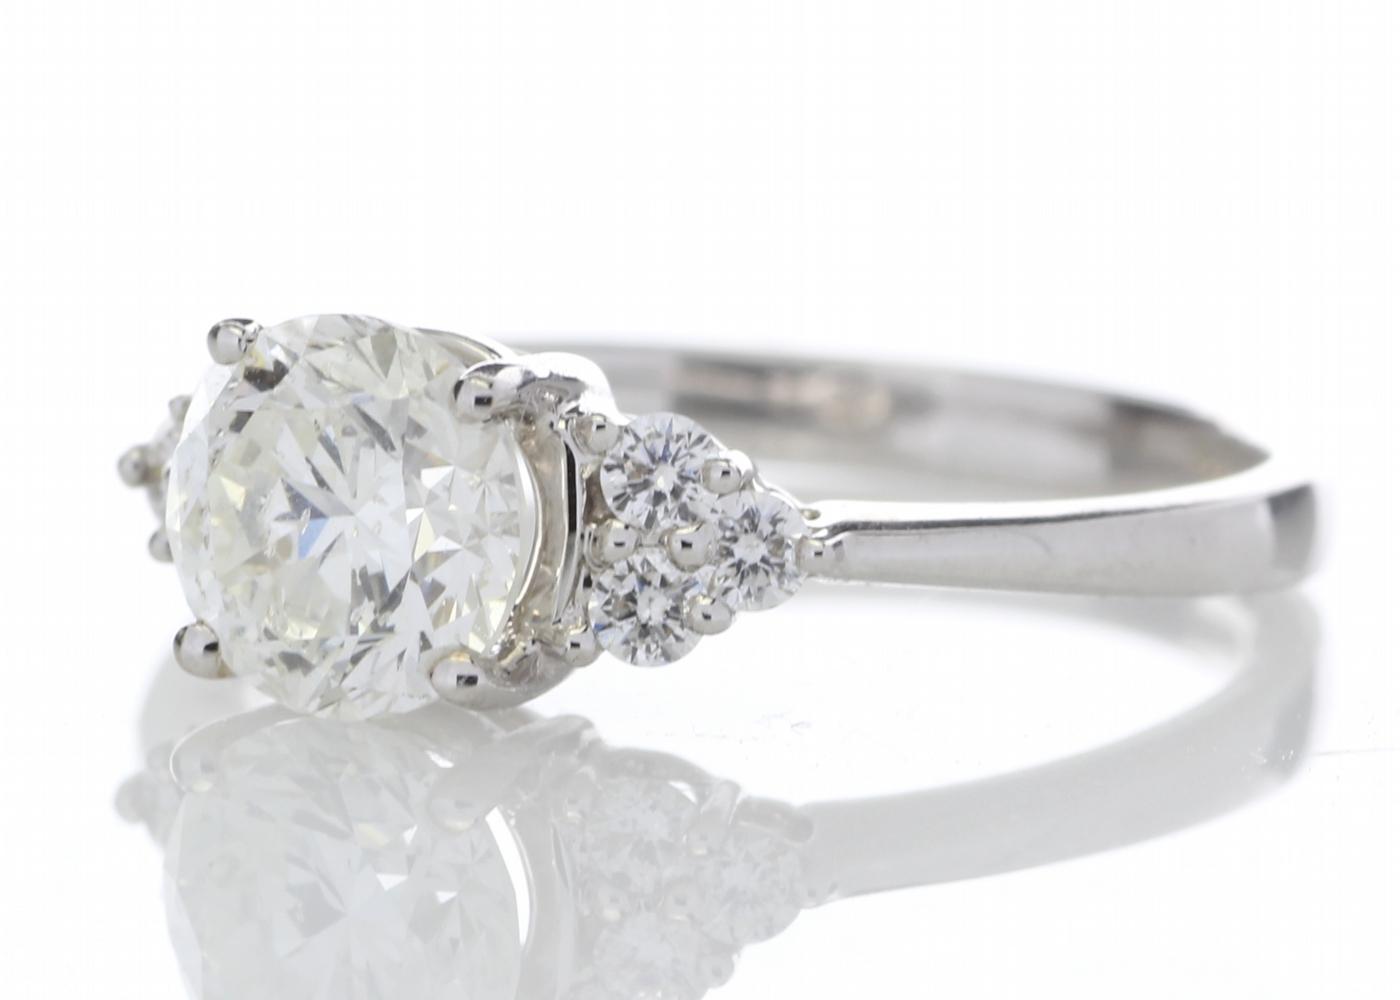 18ct White Gold Heart Shape Diamond Ring 1.29 Carats - Image 2 of 5